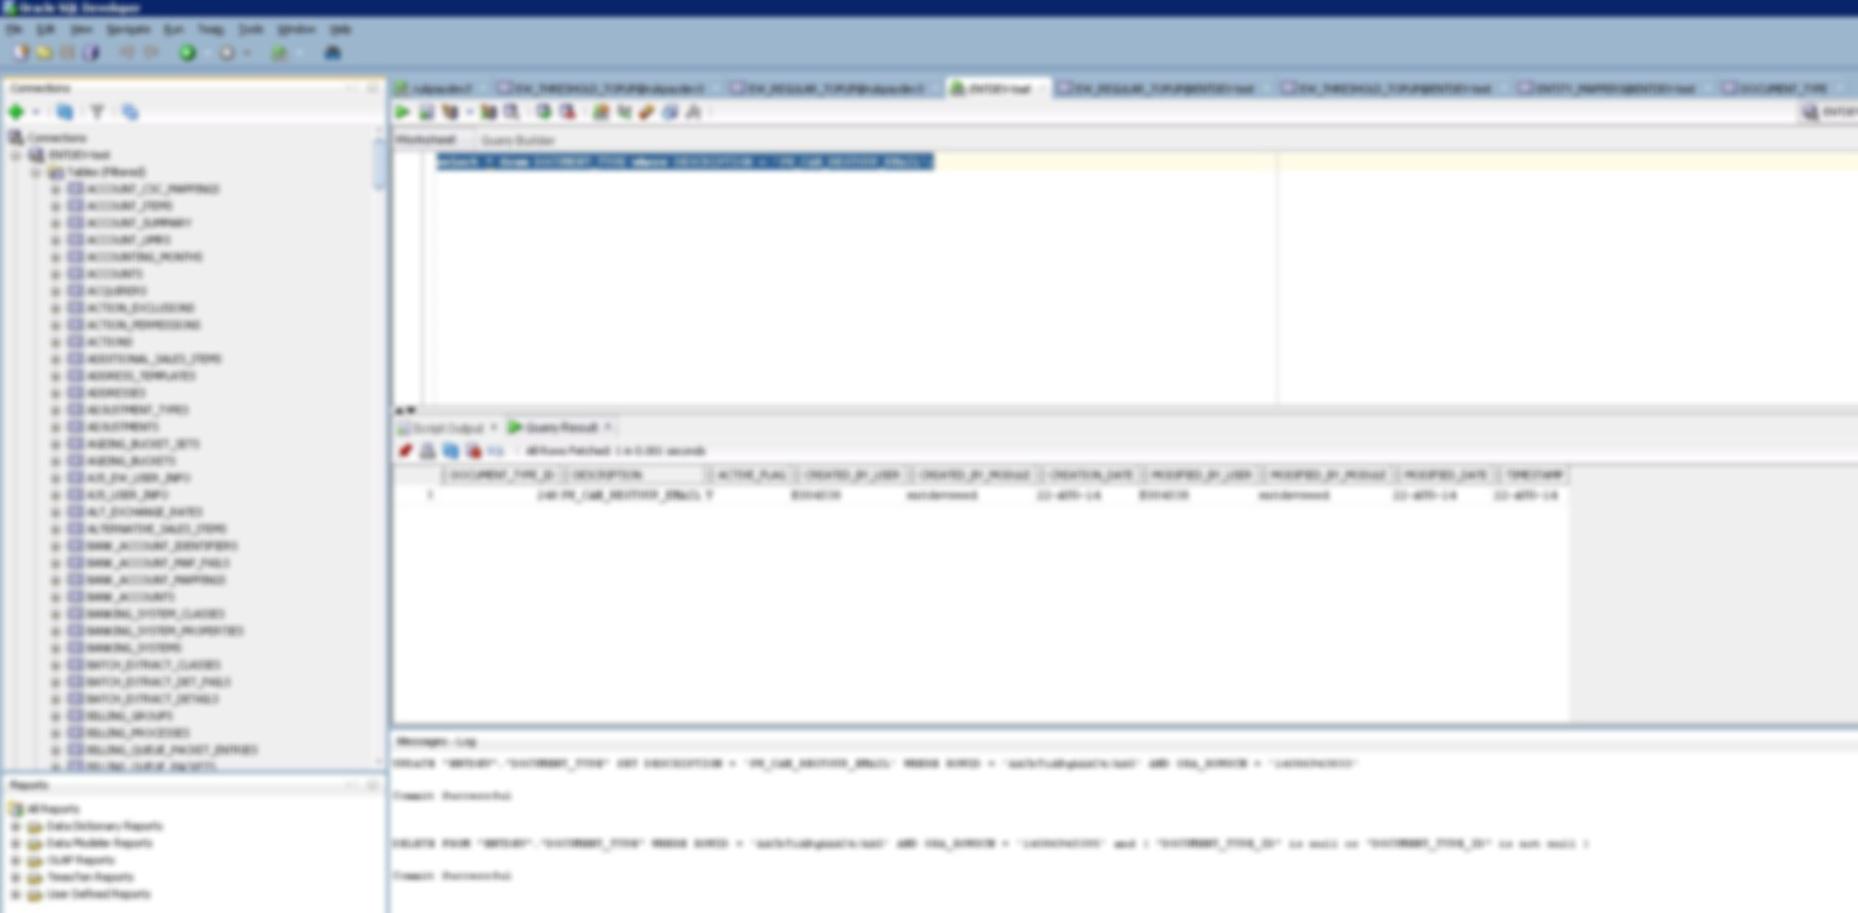 Screen of Oracle SQL Developer software.